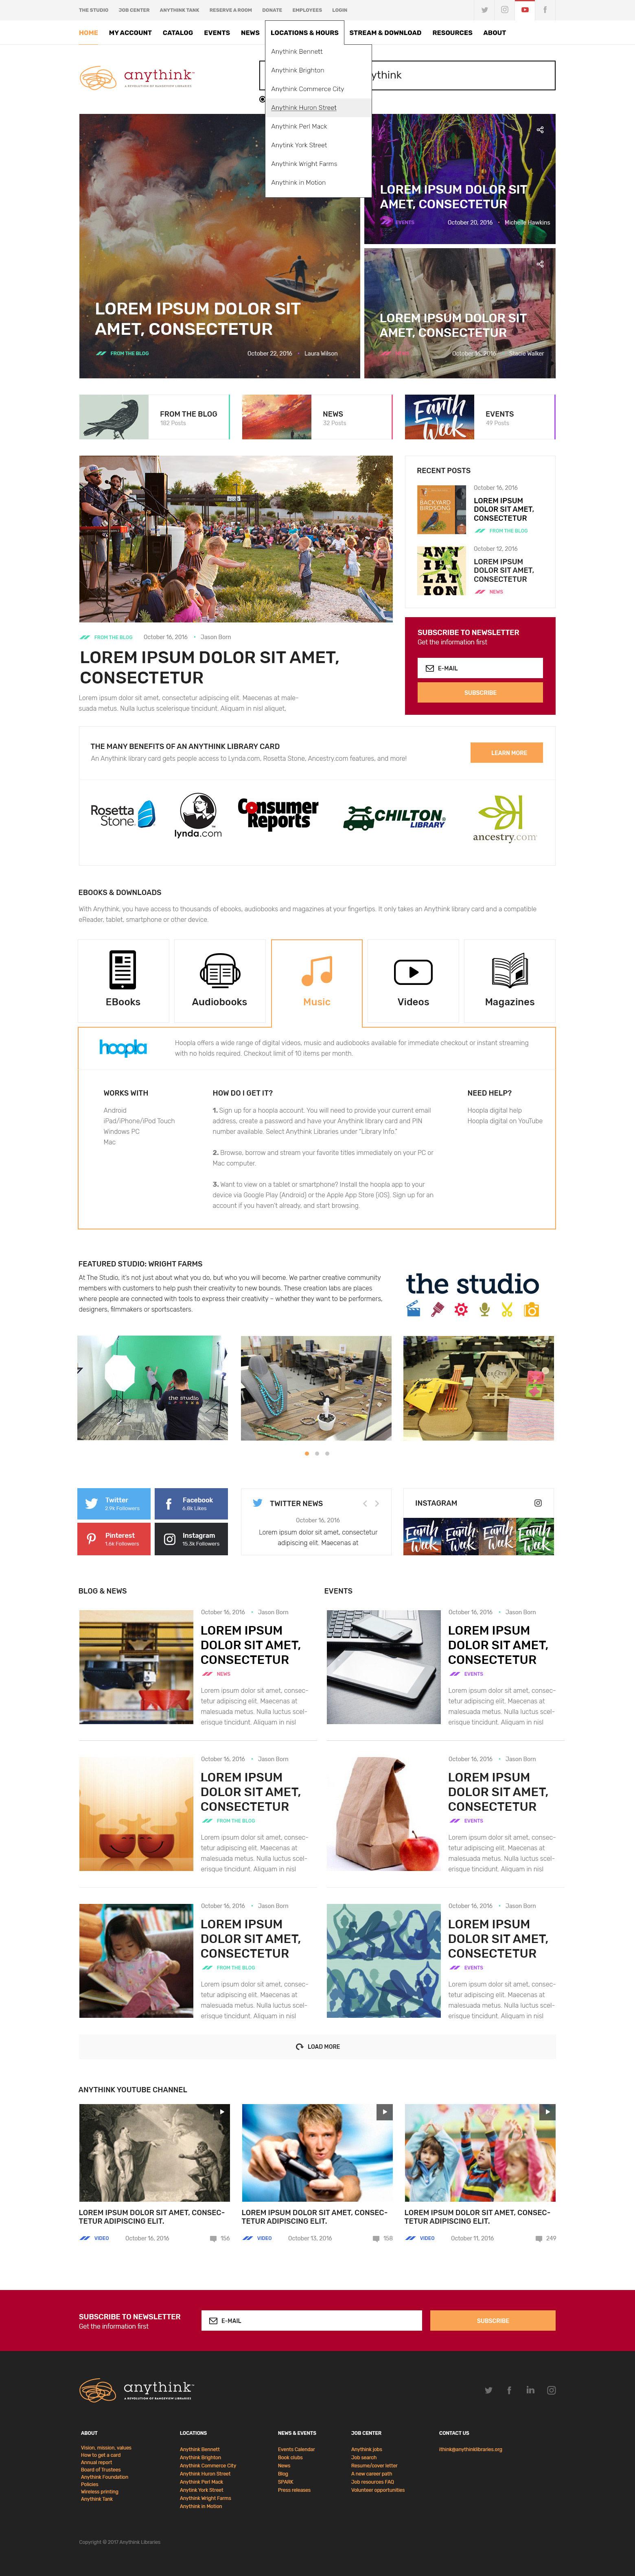 Website Design and Development, Denver